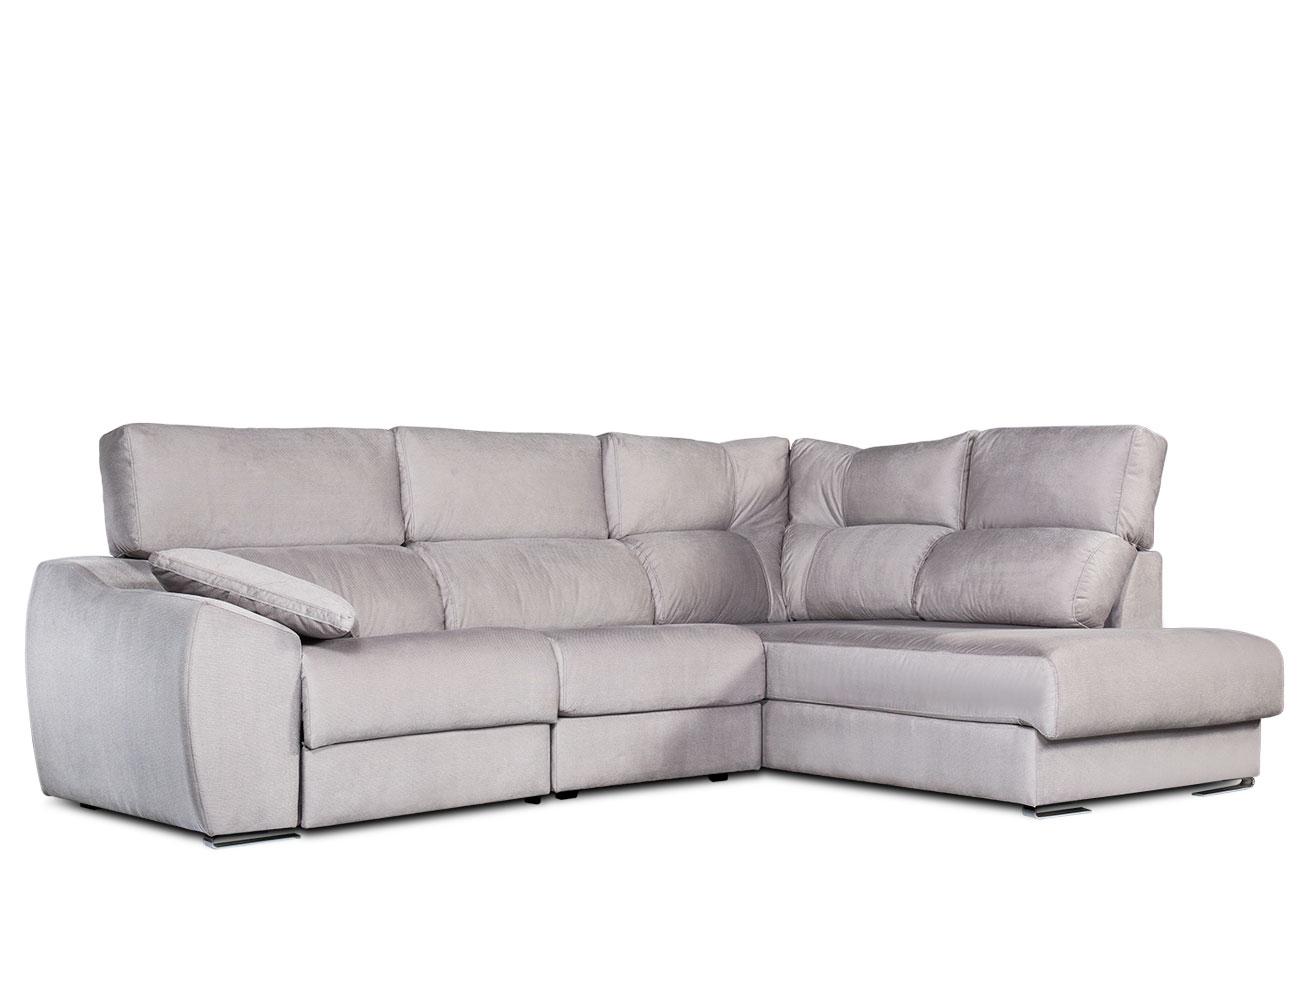 Sofa chaiselongue rincon electrico4